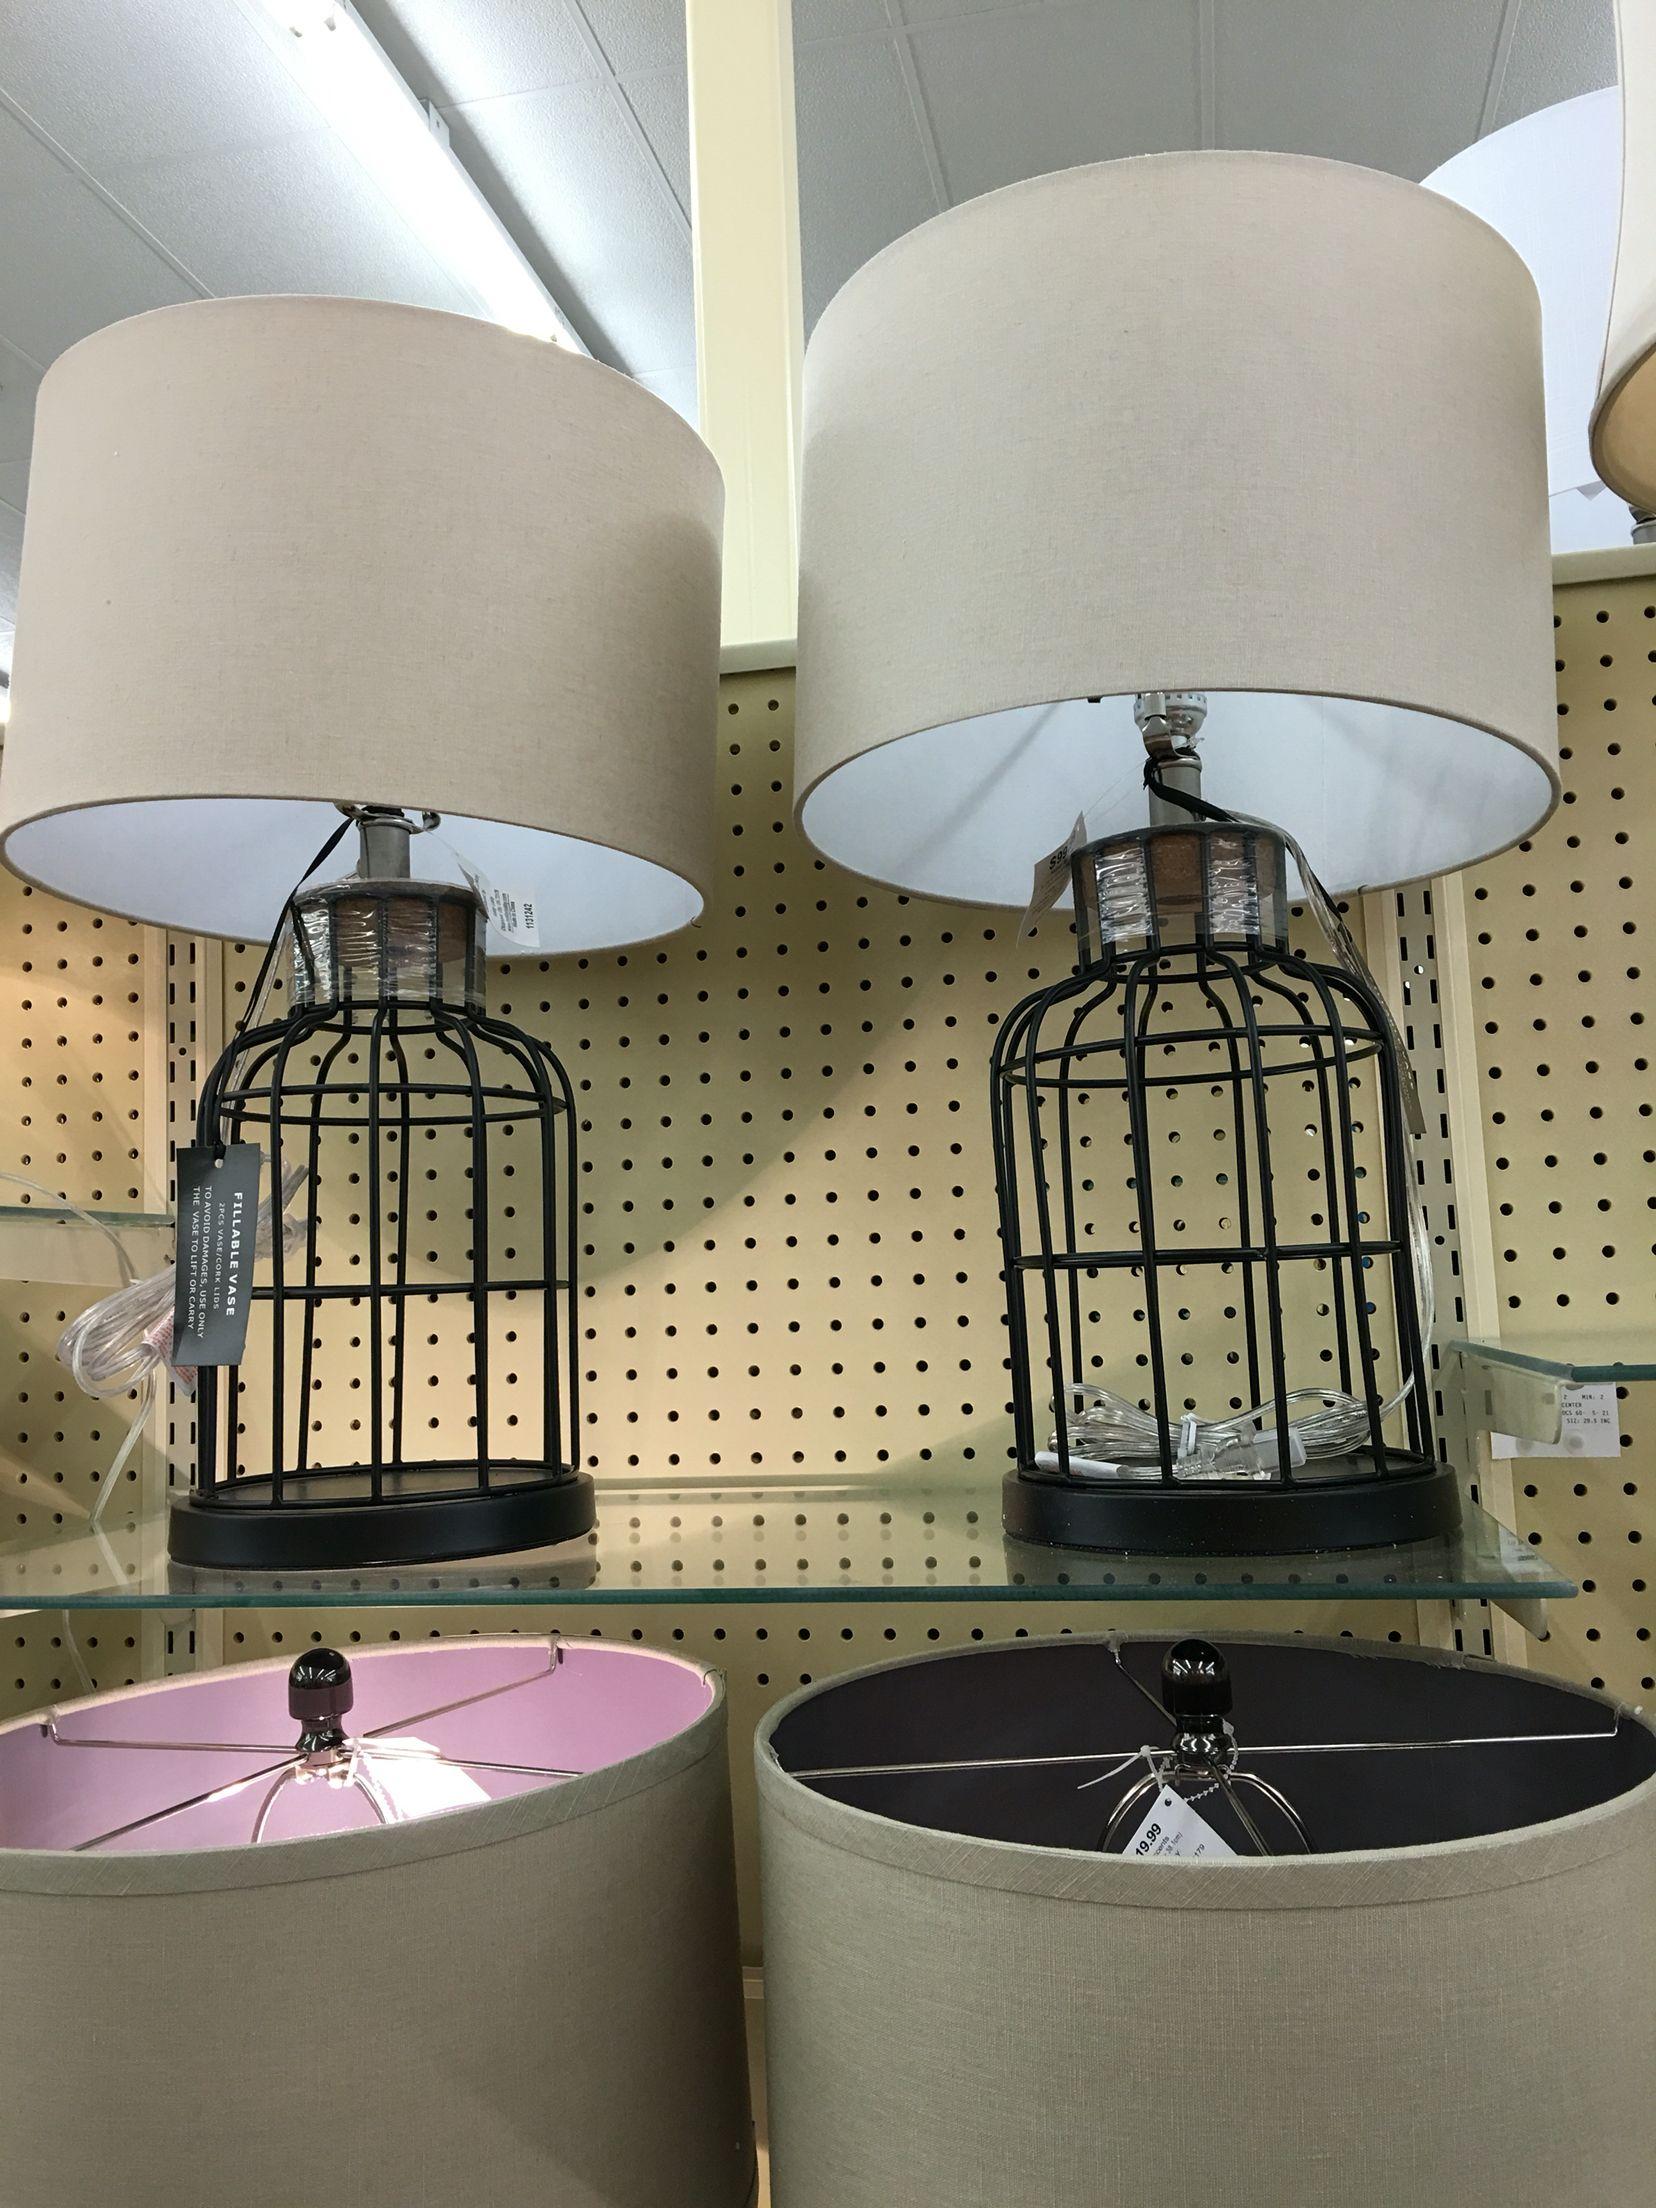 Fillable Lamps Hobby Lobby Lamp Glow Diy Ideas